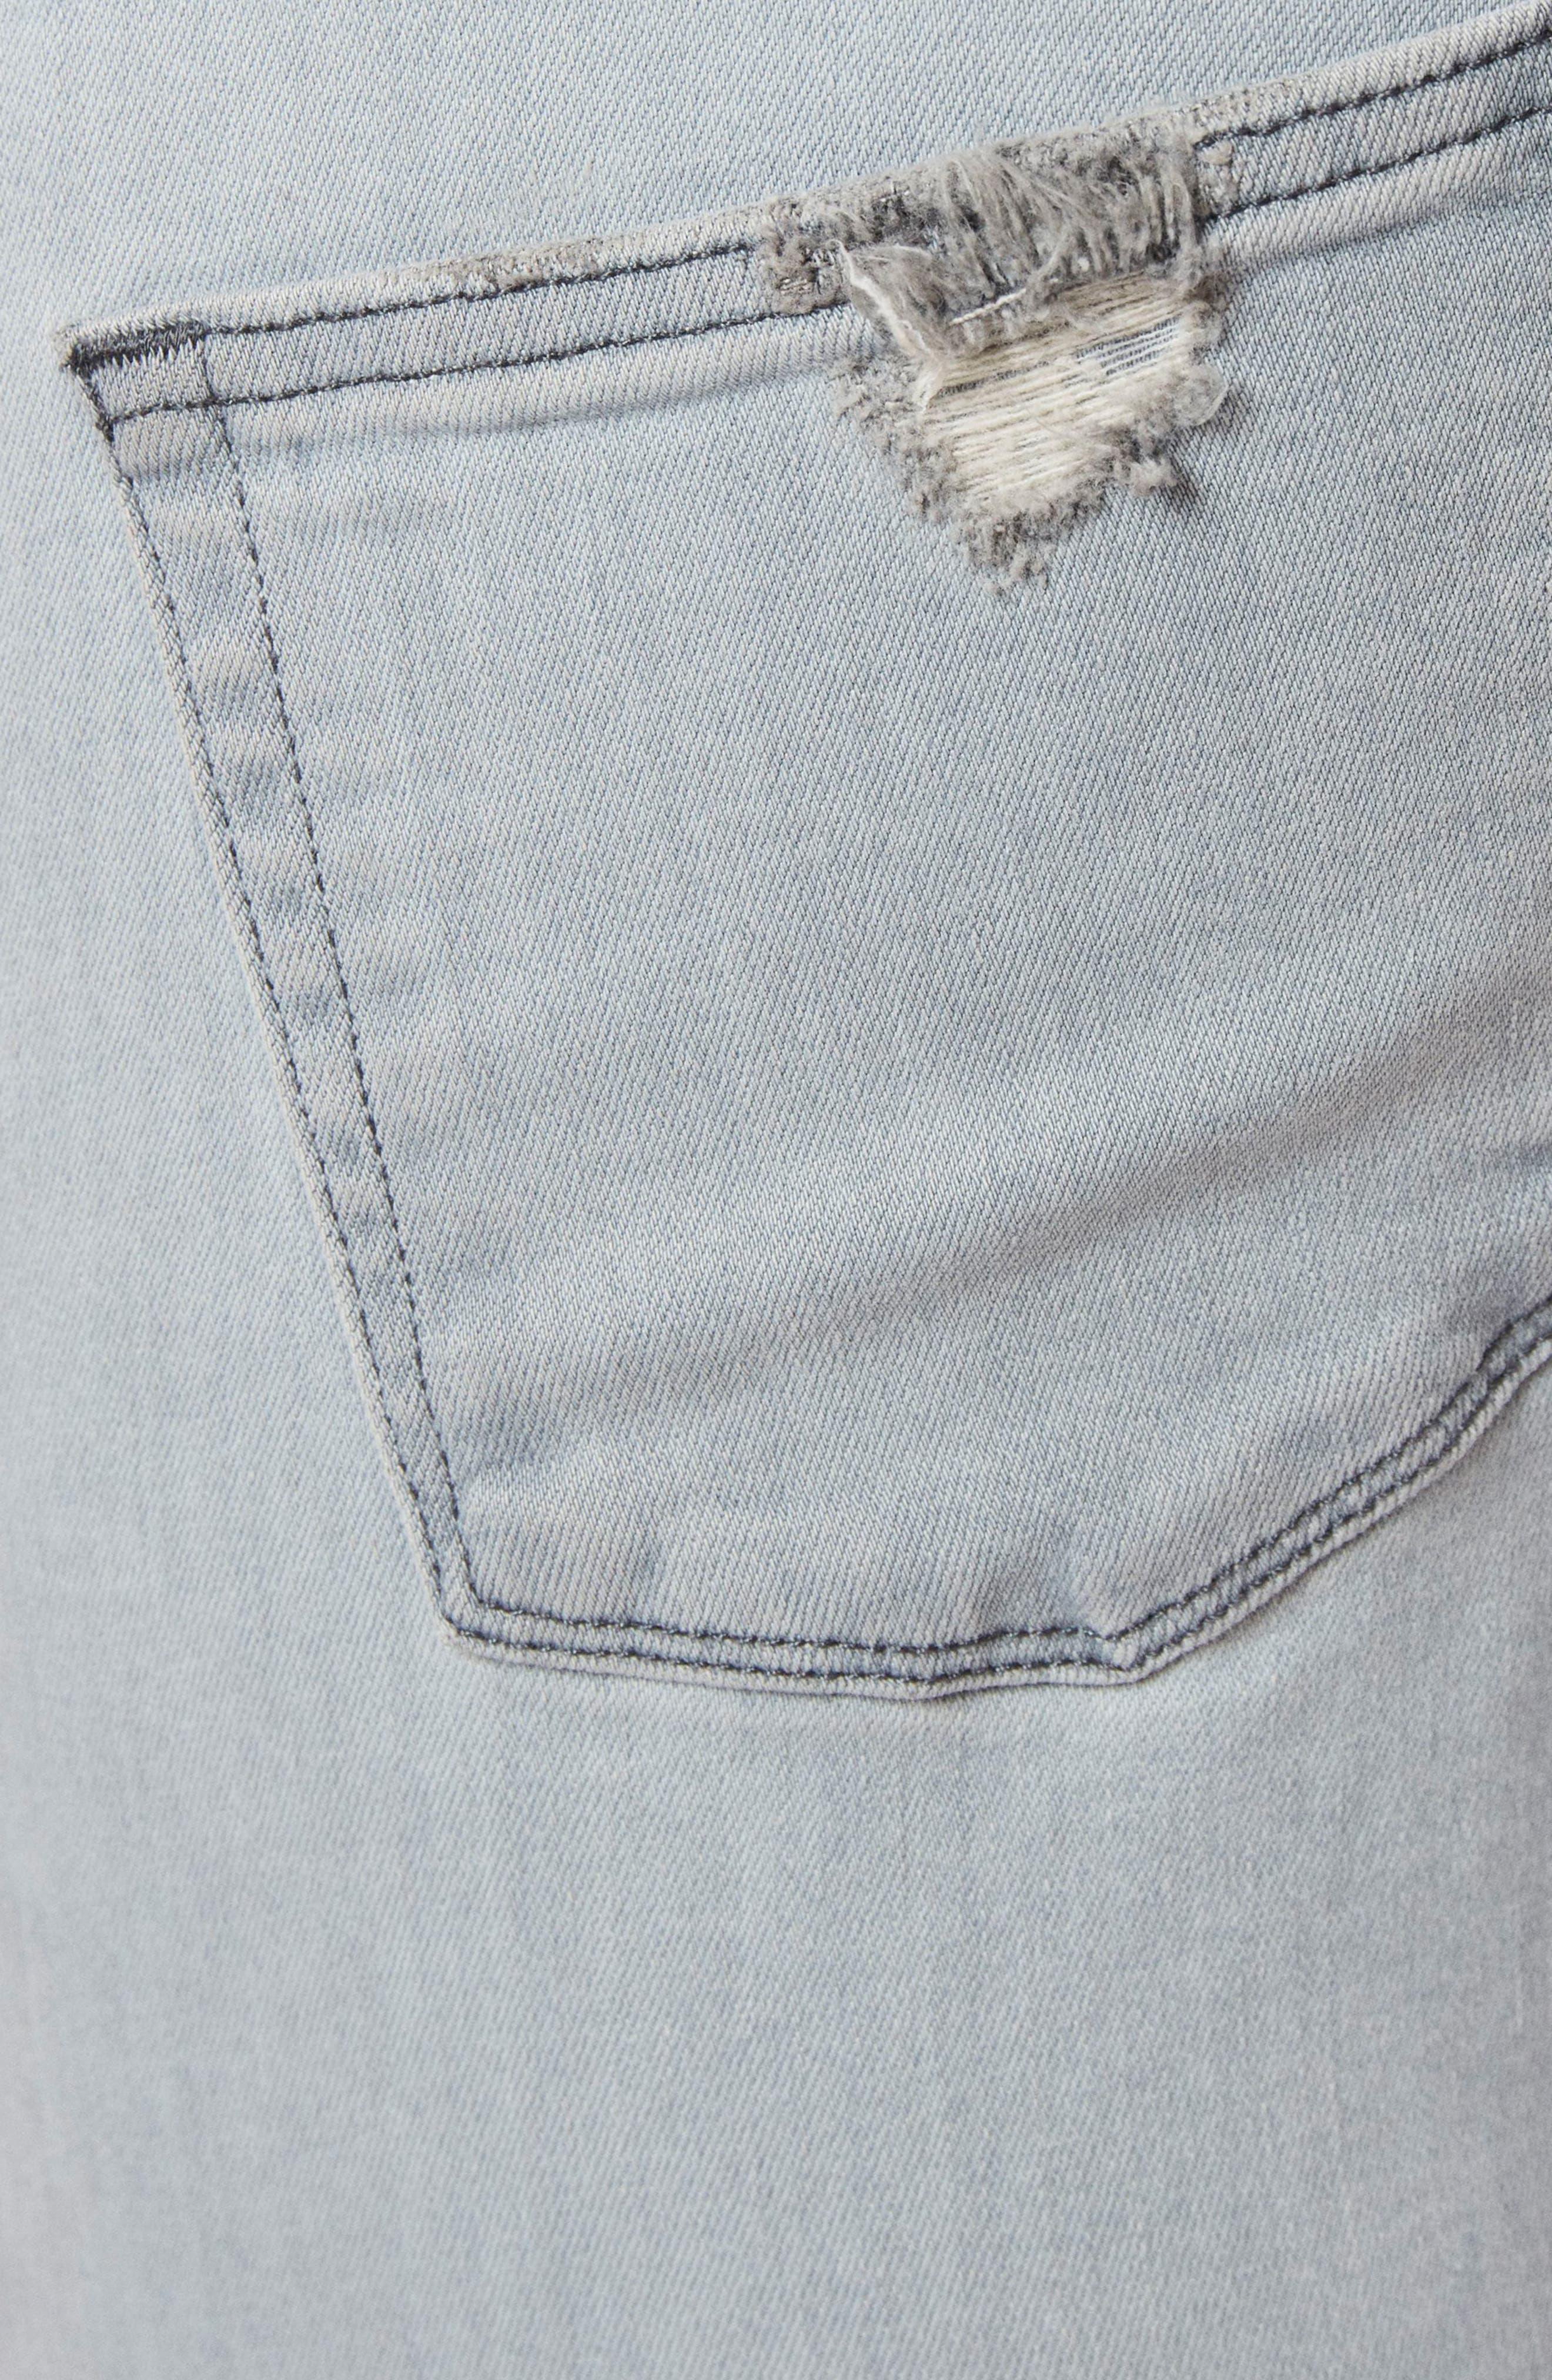 Tyler Slim Fit Jeans,                             Alternate thumbnail 5, color,                             Trounced Porpoise